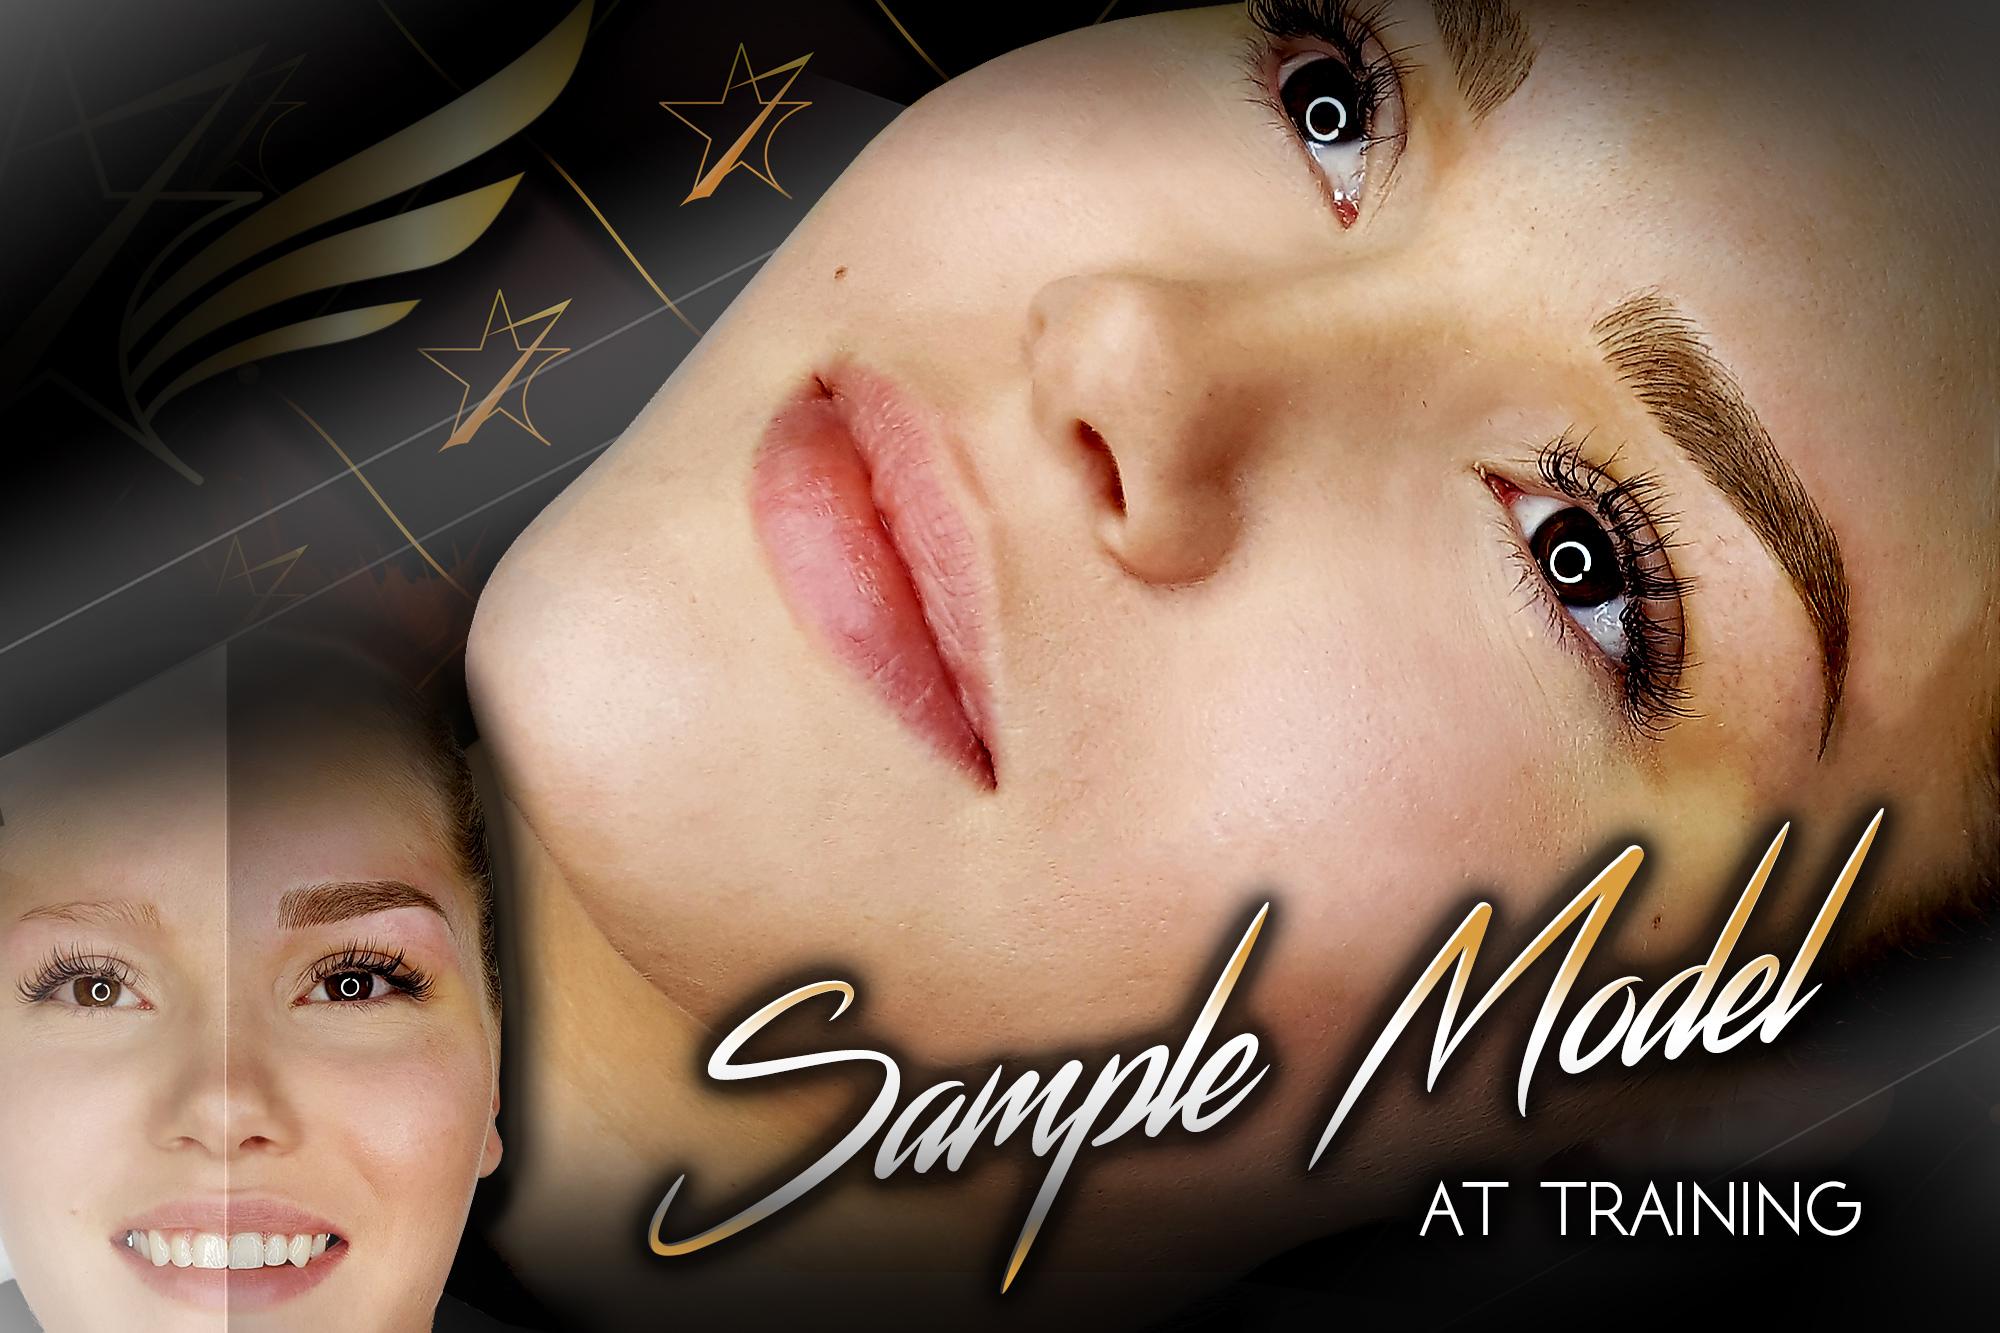 samplemodels.jpg